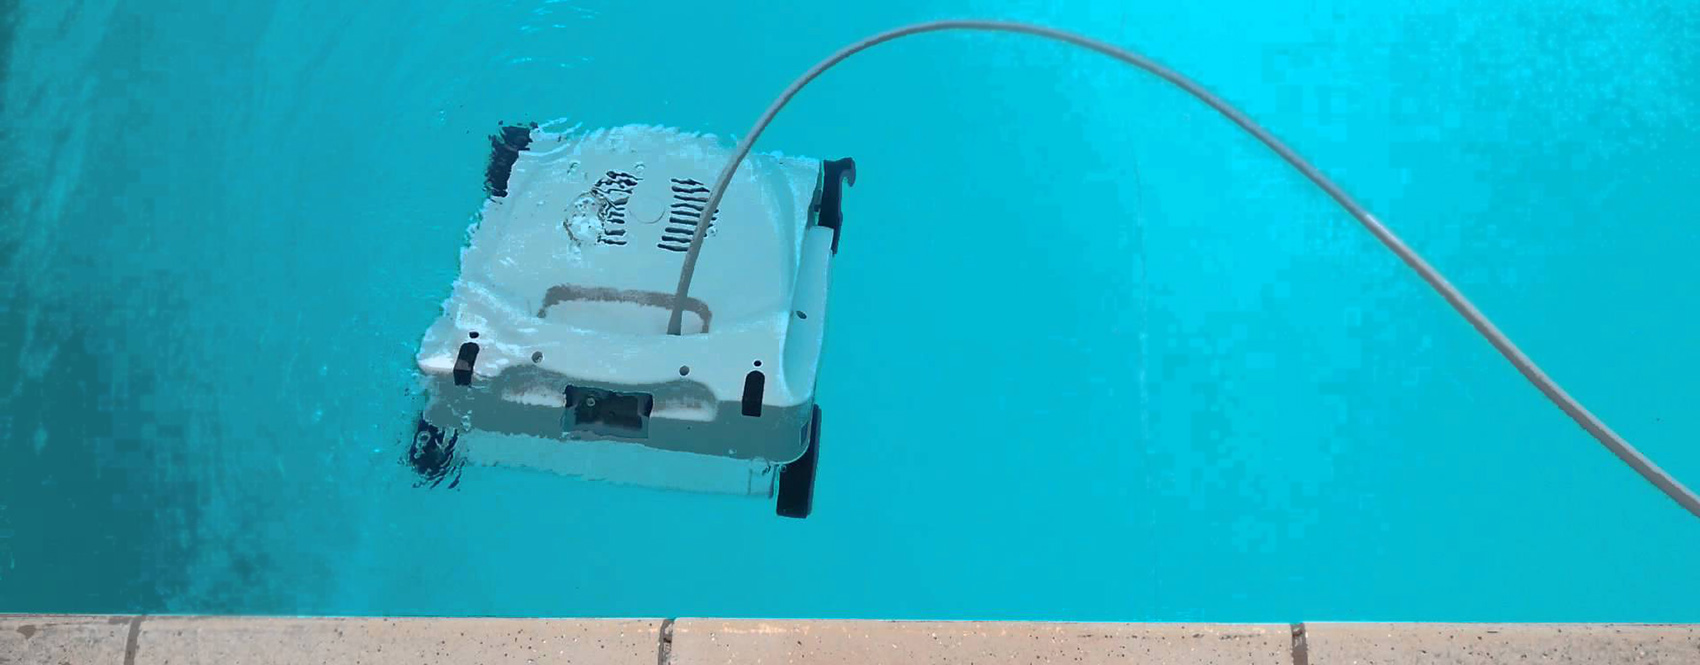 Entretien maintenance piscine vend e chauffage installation 85 for Entretien piscine